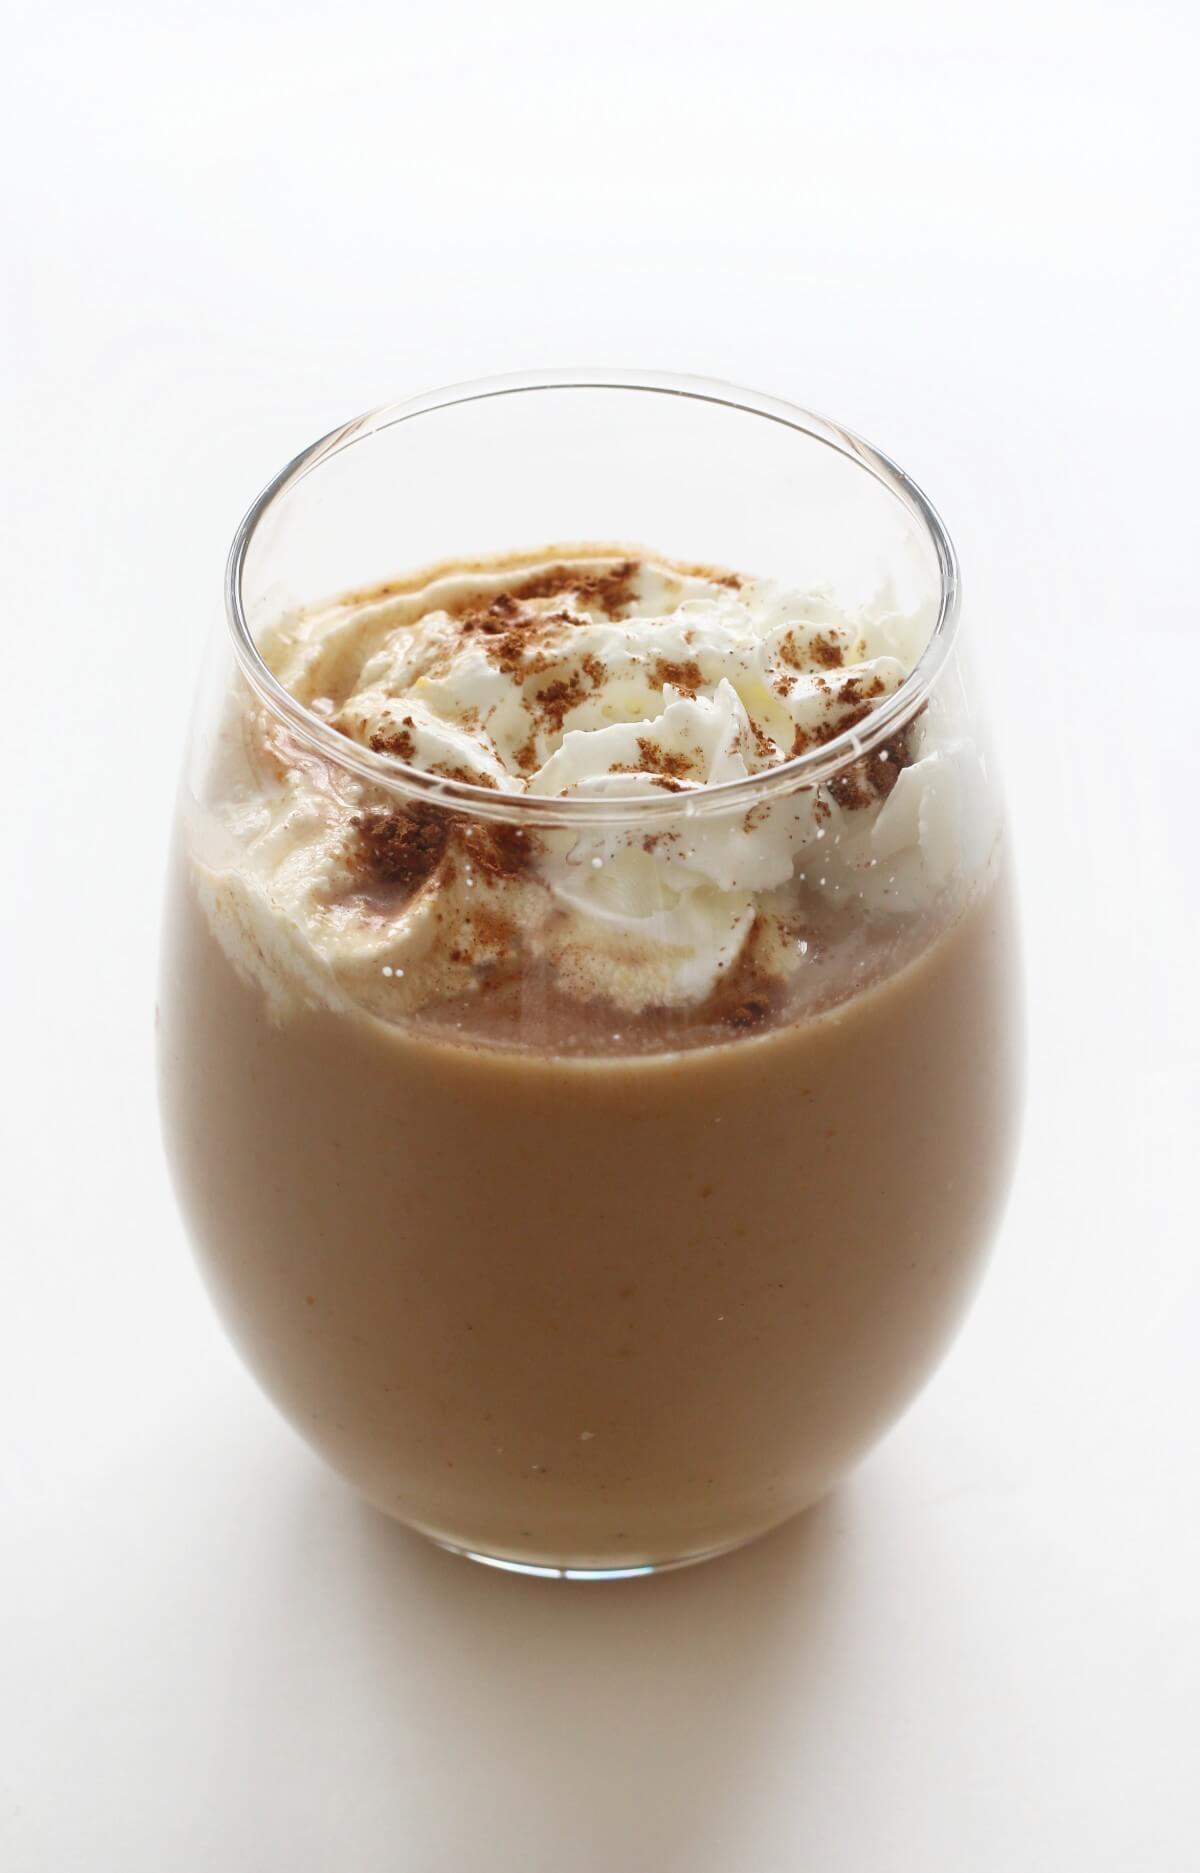 one finished hot vegan pumpkin spice latte in glass